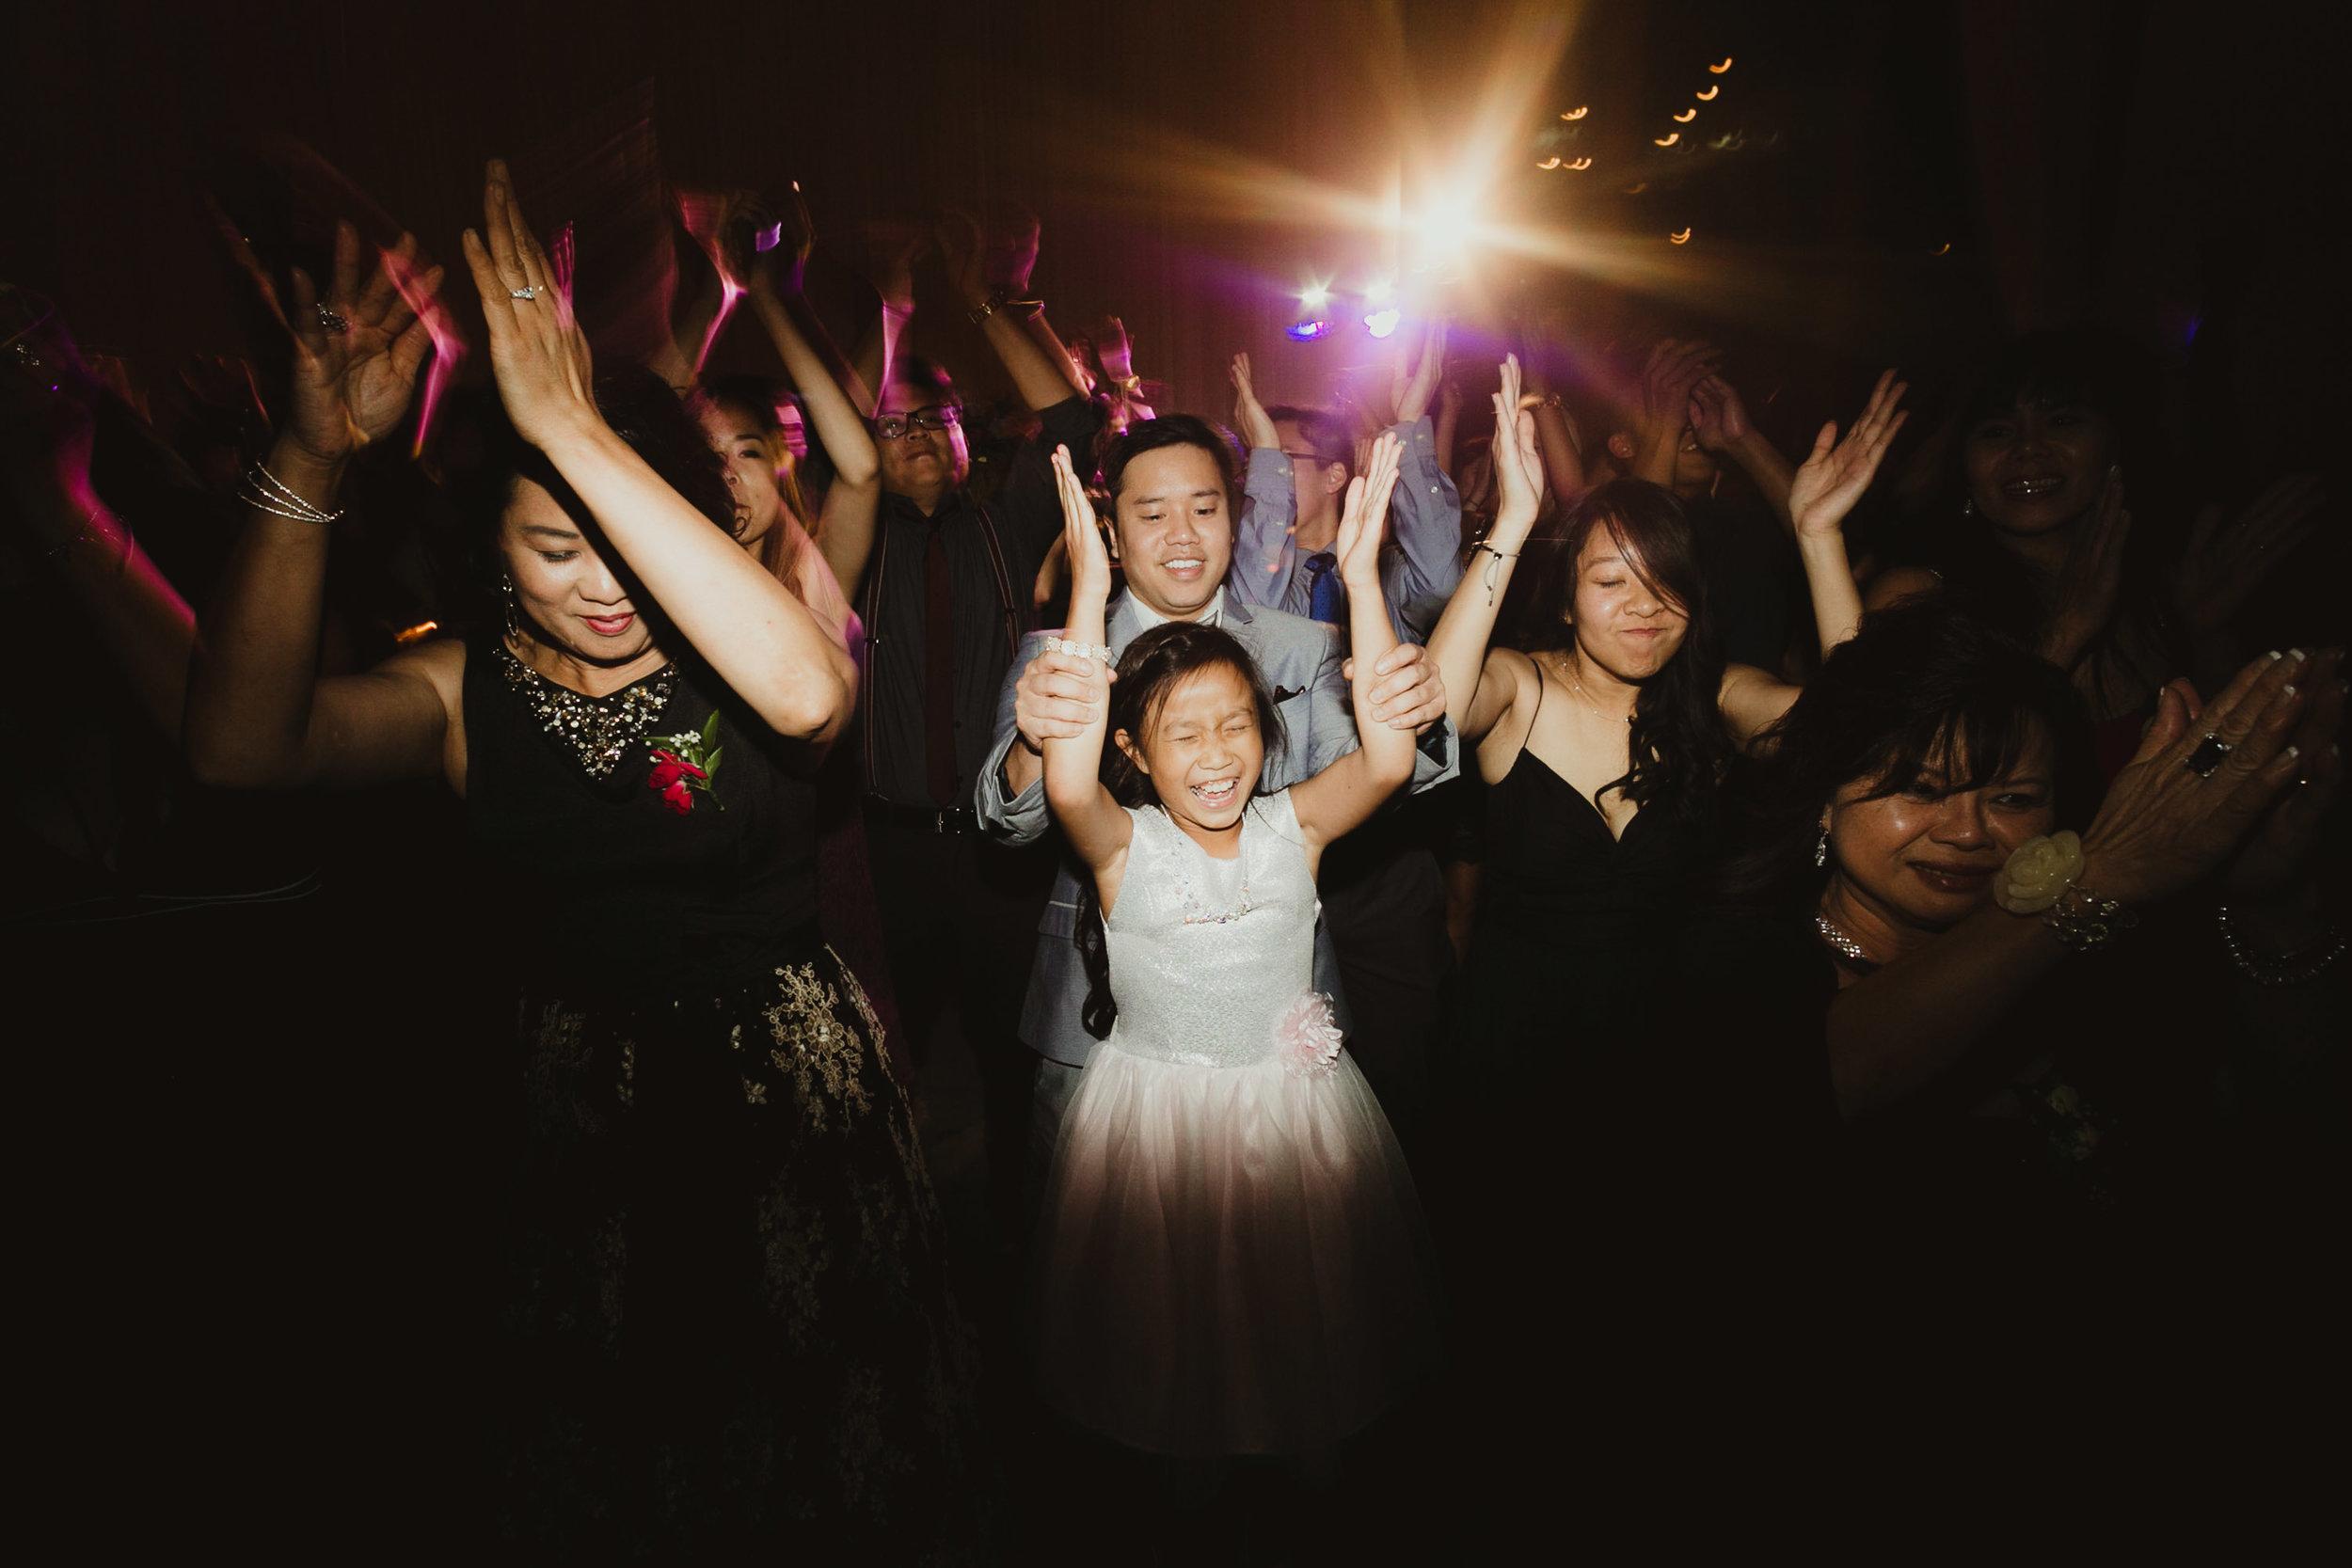 kansas-city-wedding-photographer_054.jpg